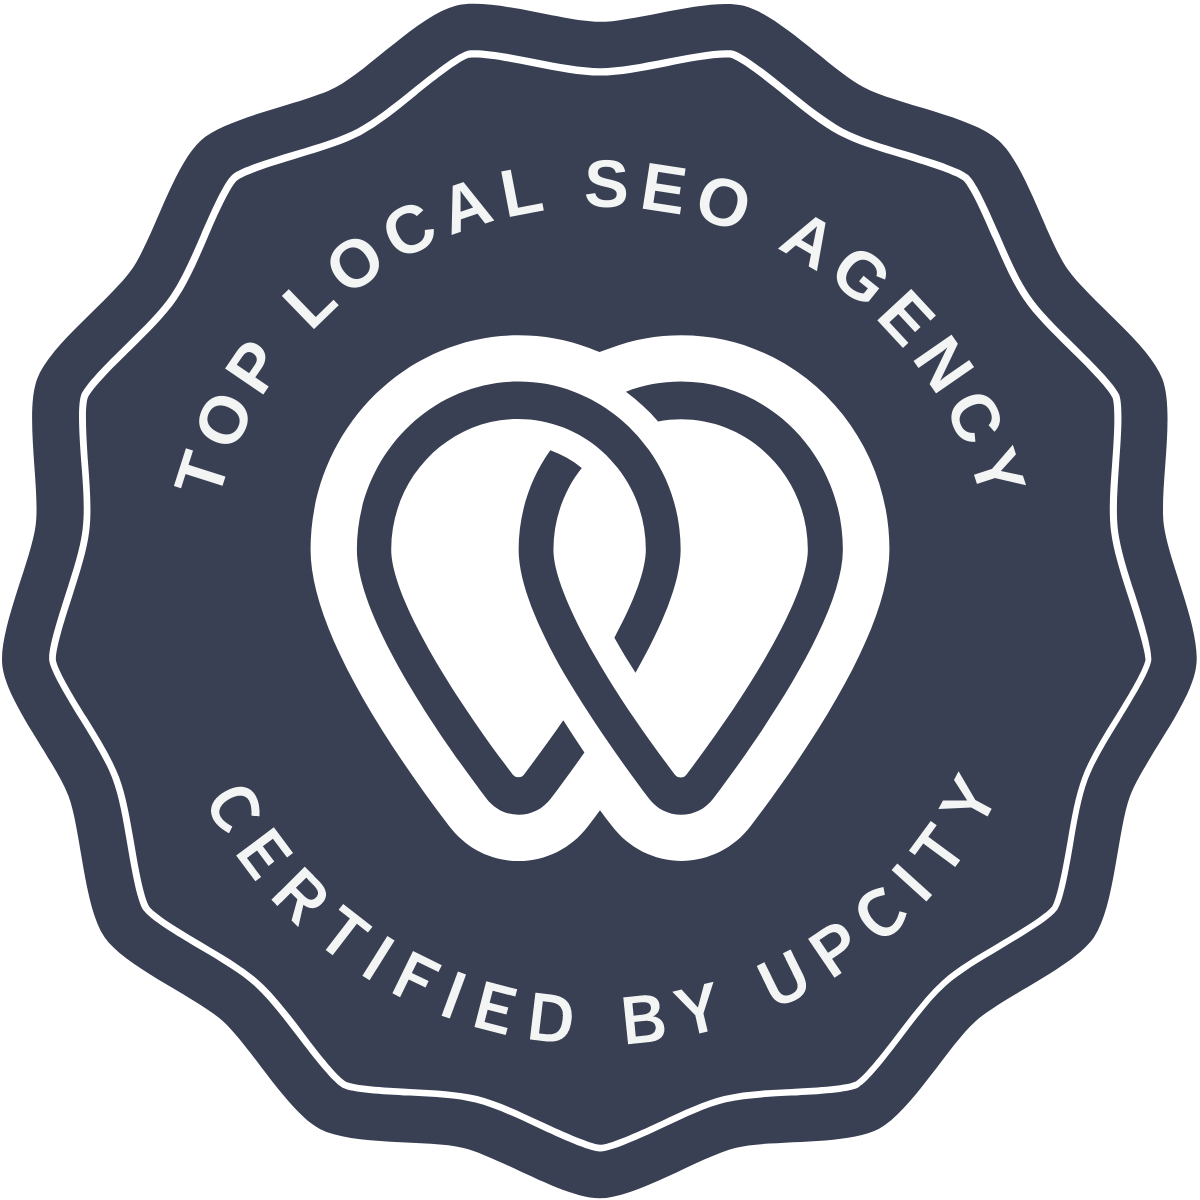 Top Jacksonville Local SEO Agency